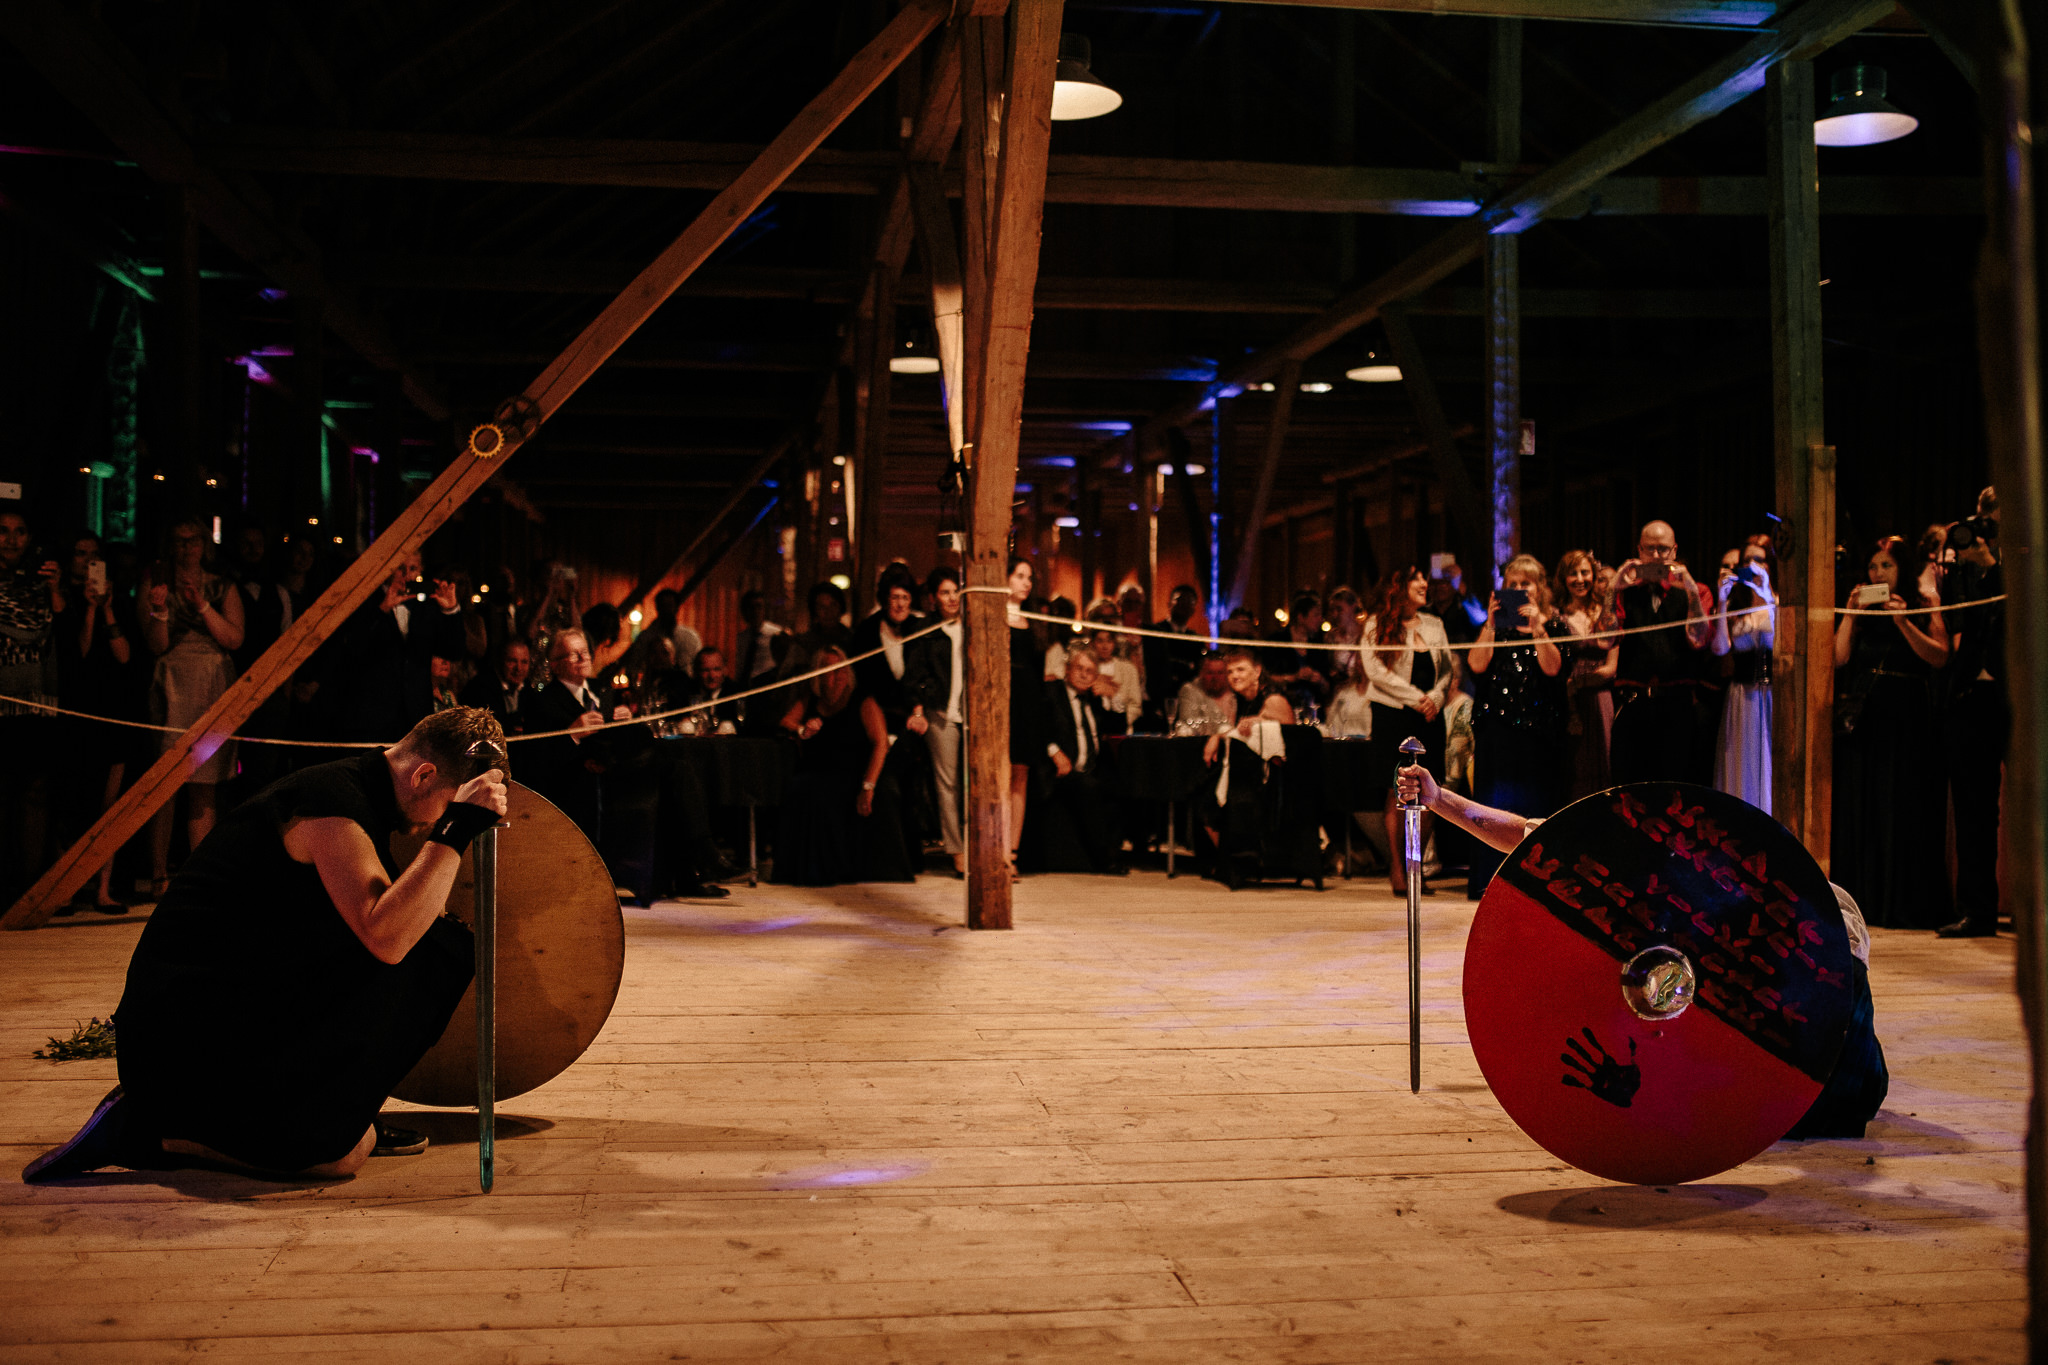 Ceren & Jani - Finland Wedding Photographer - Weddings by Qay - Wedding Photographer (130 of 166).jpg